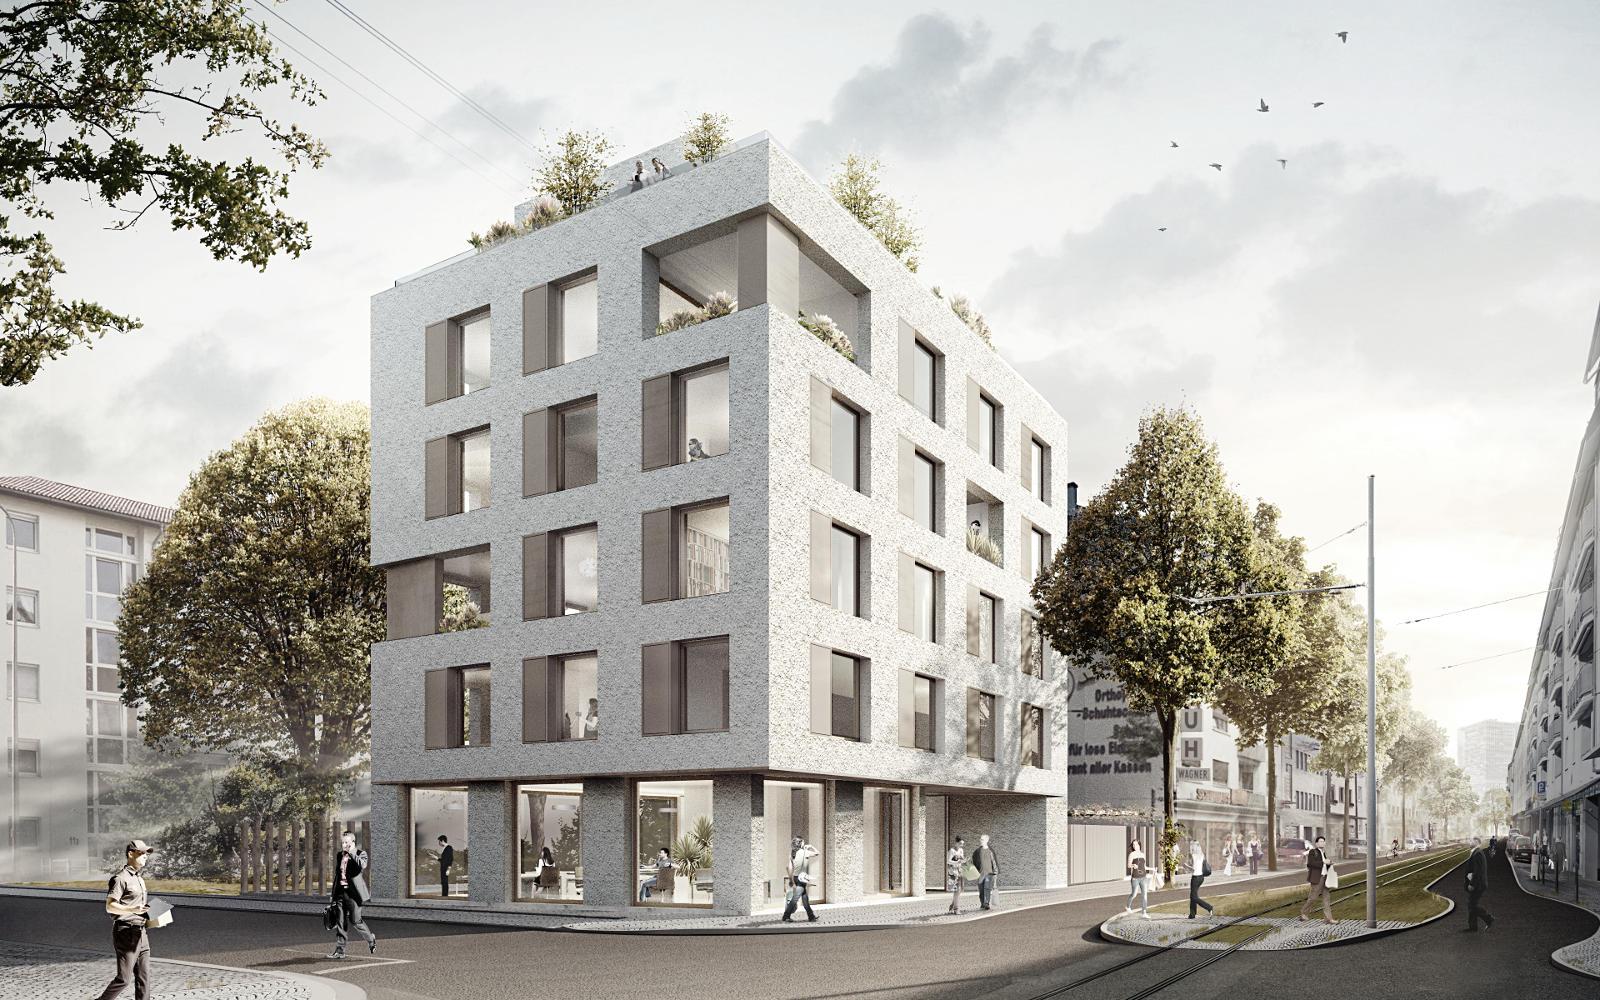 038 stadthaus m7 e7 architekten. Black Bedroom Furniture Sets. Home Design Ideas